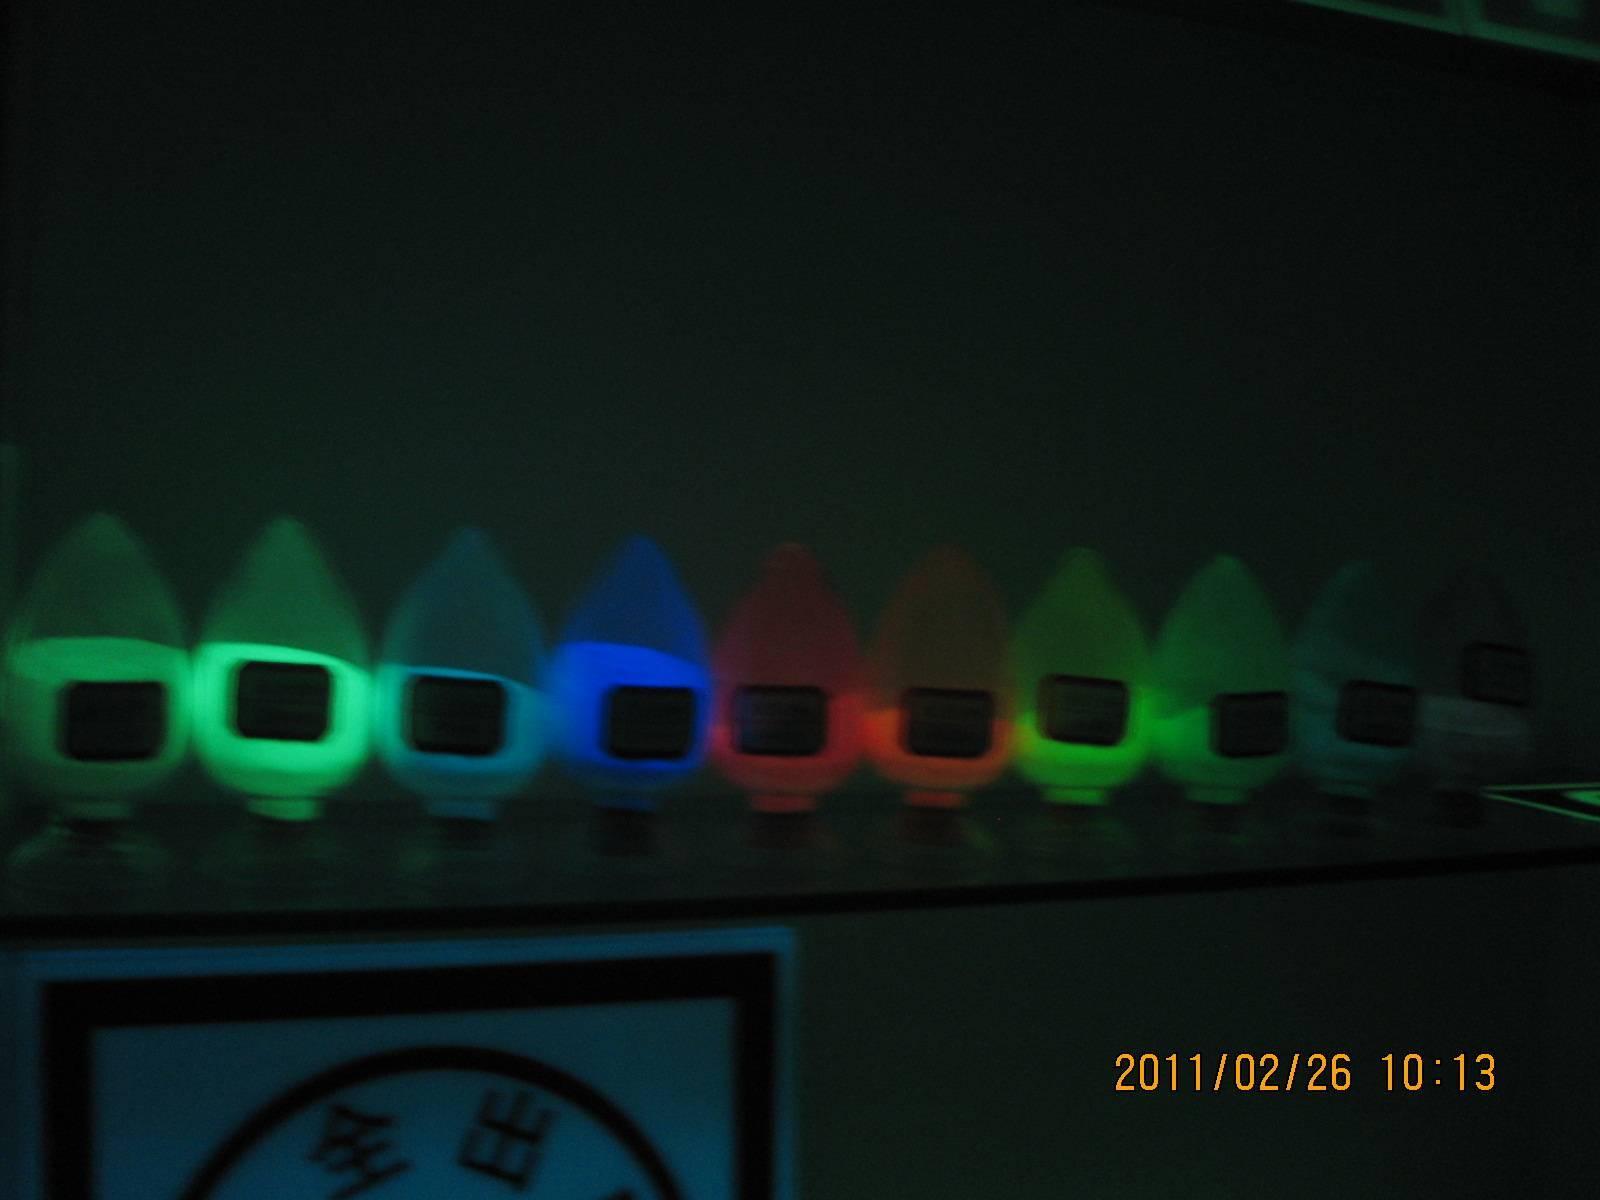 luminescent pigments